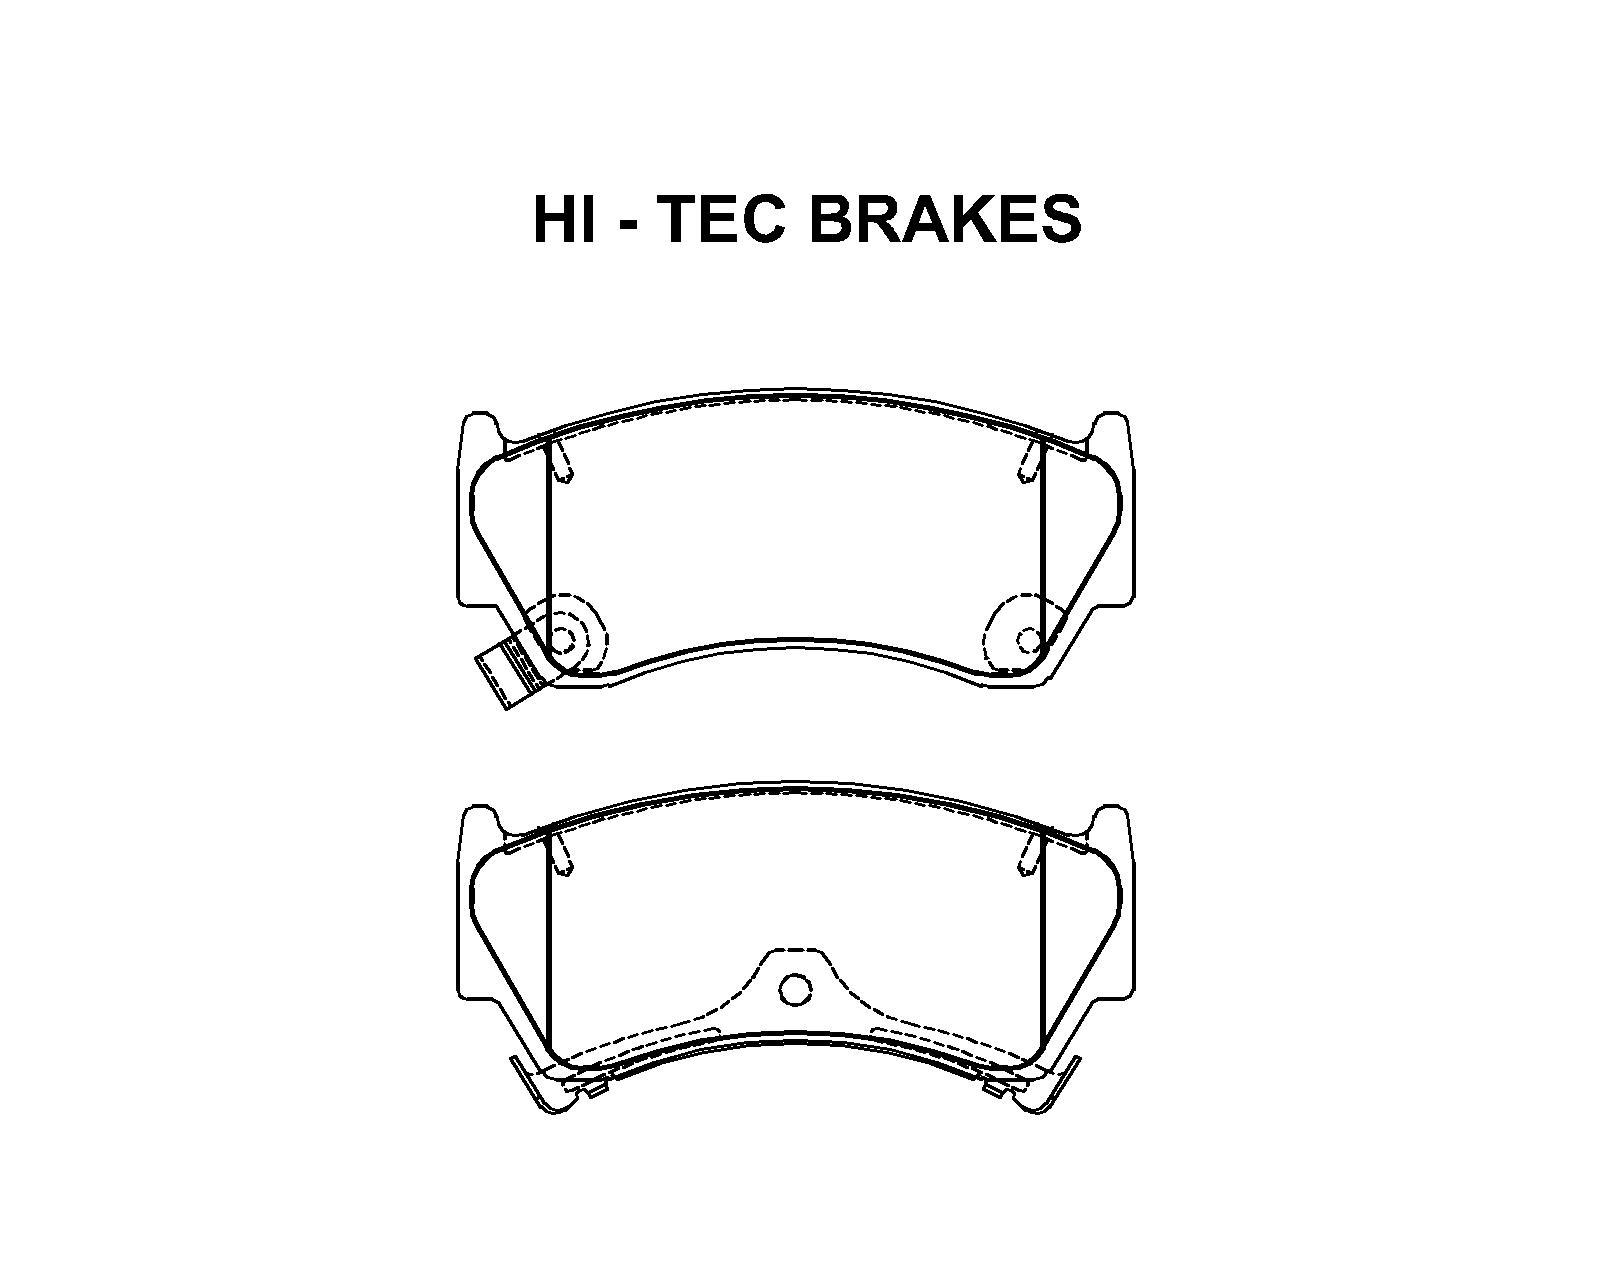 FMSI: 7546-D668 Ceramic Brakes Pads. Our Part No:7546-668